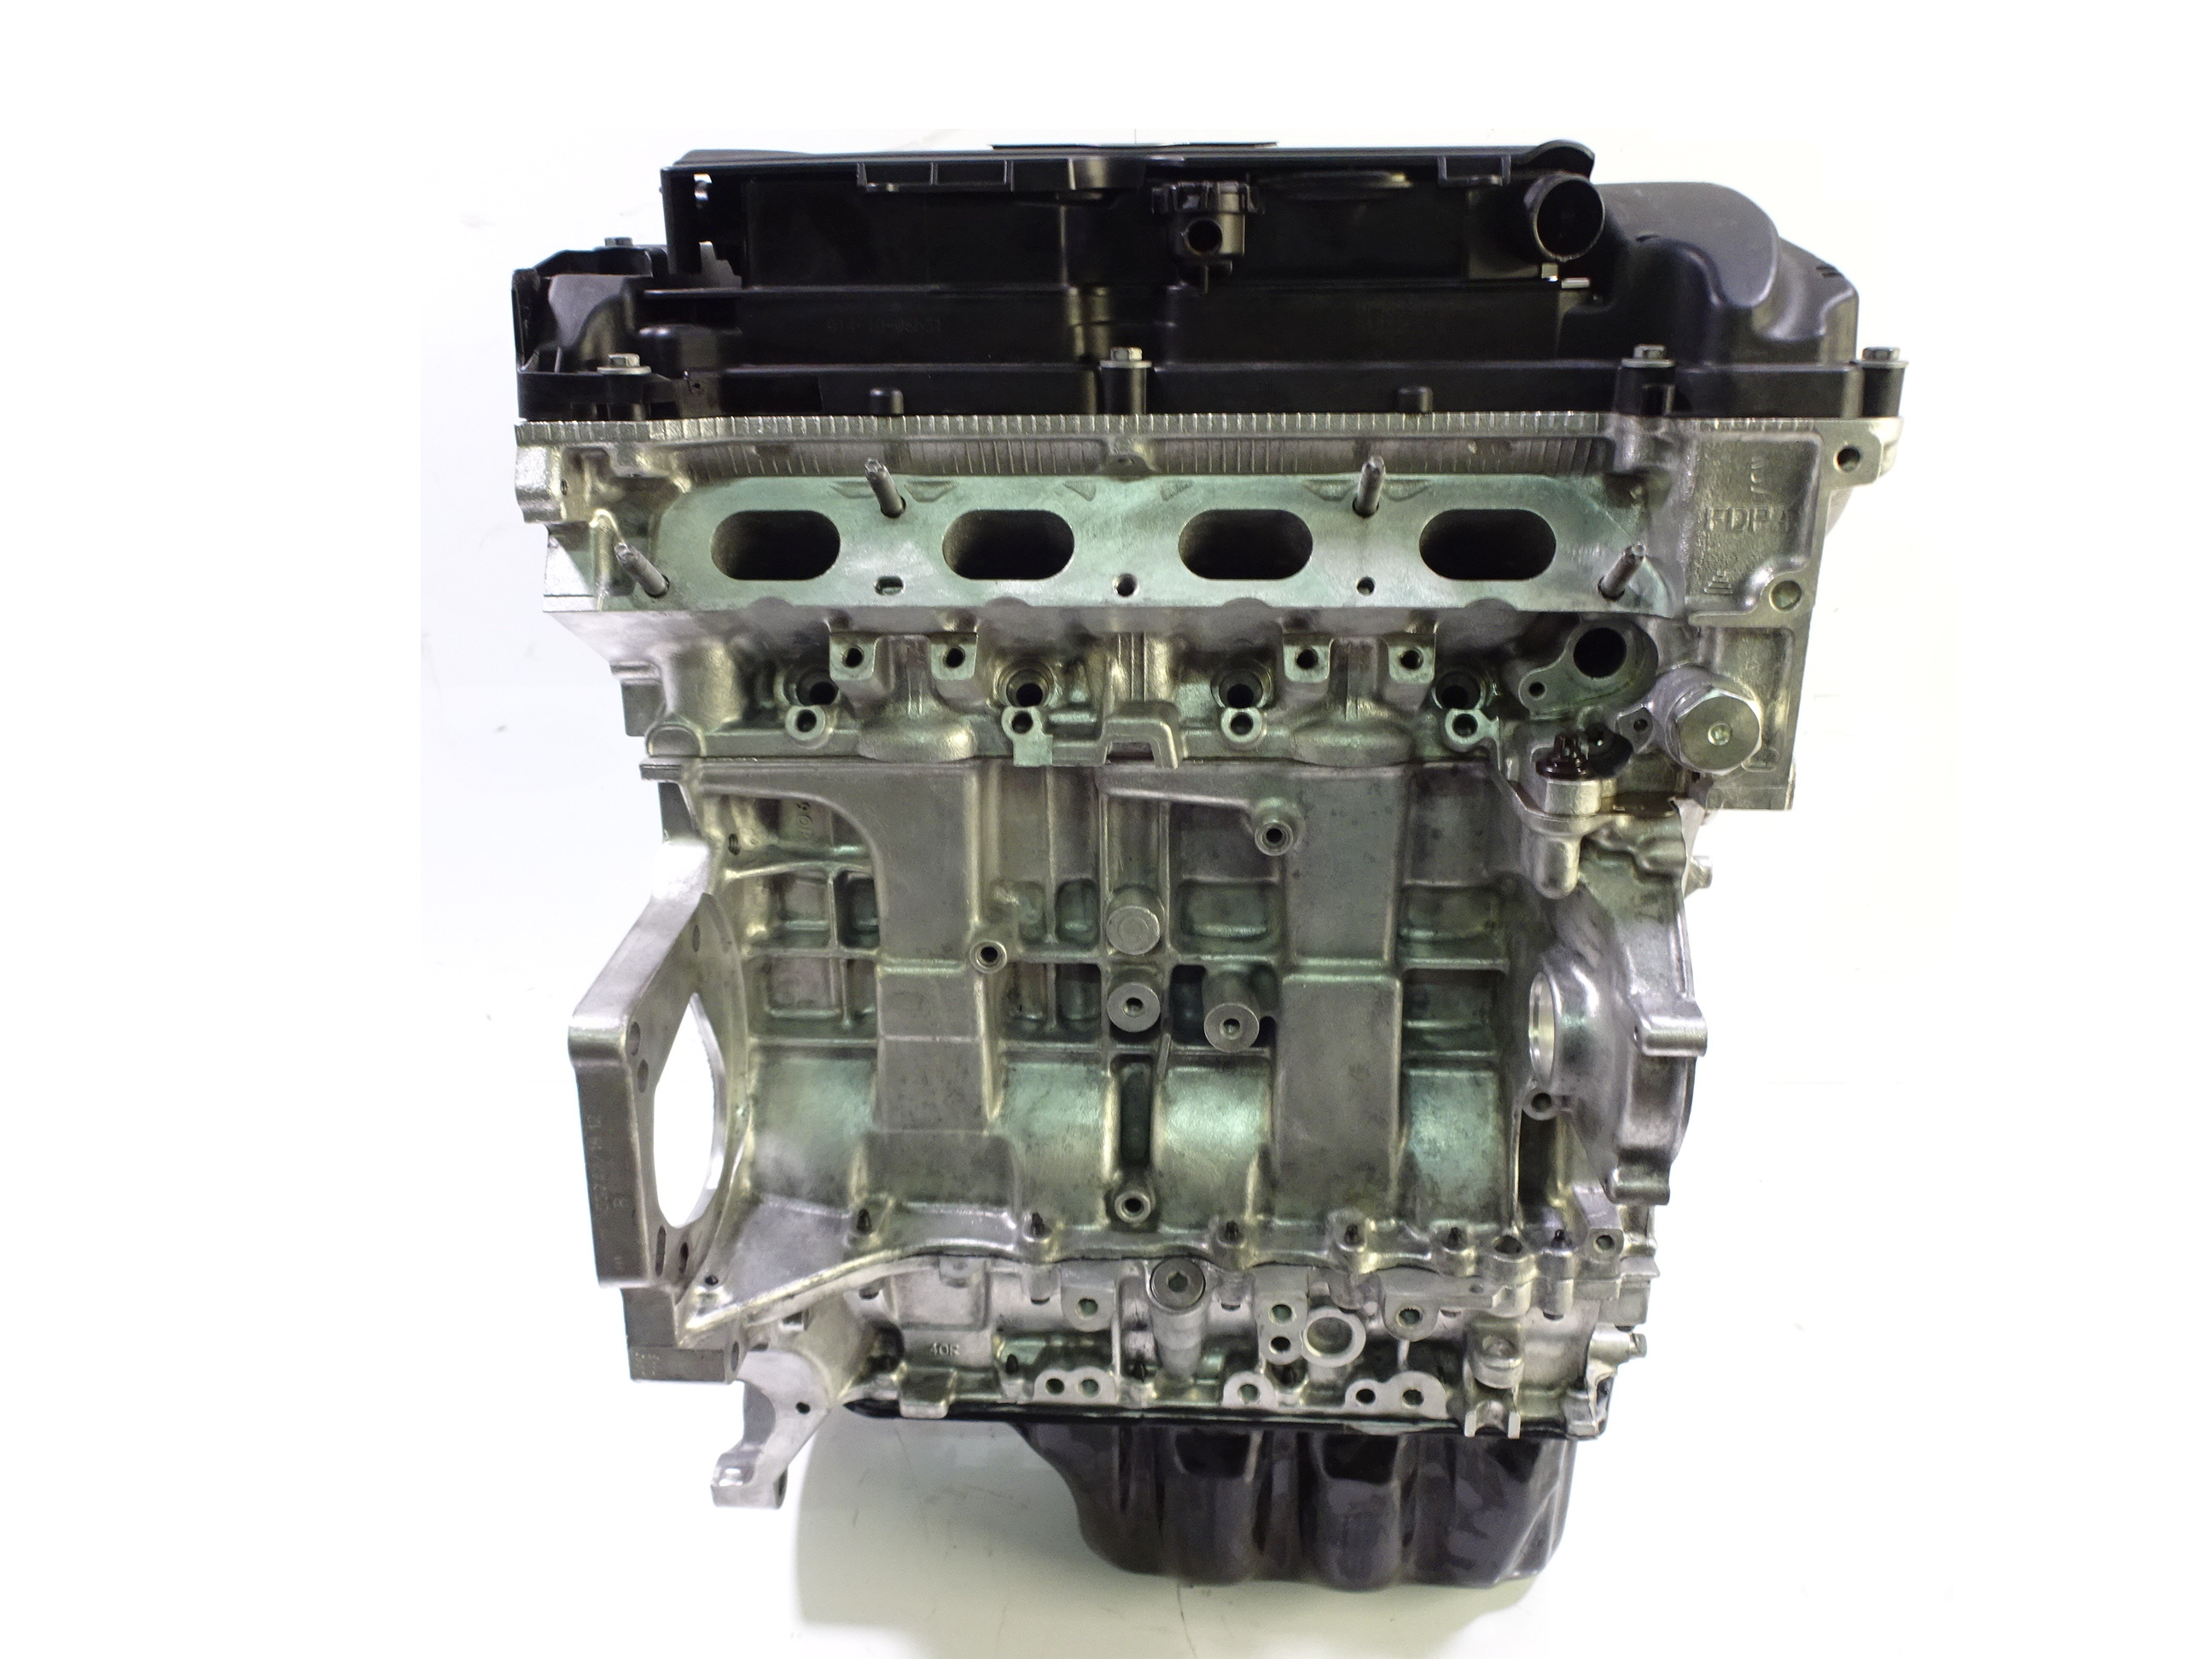 Motor 2008 Mini R56 R57 Clubman R55 1,6 N14B16A Kolben Kettensatz Dichtung NEU